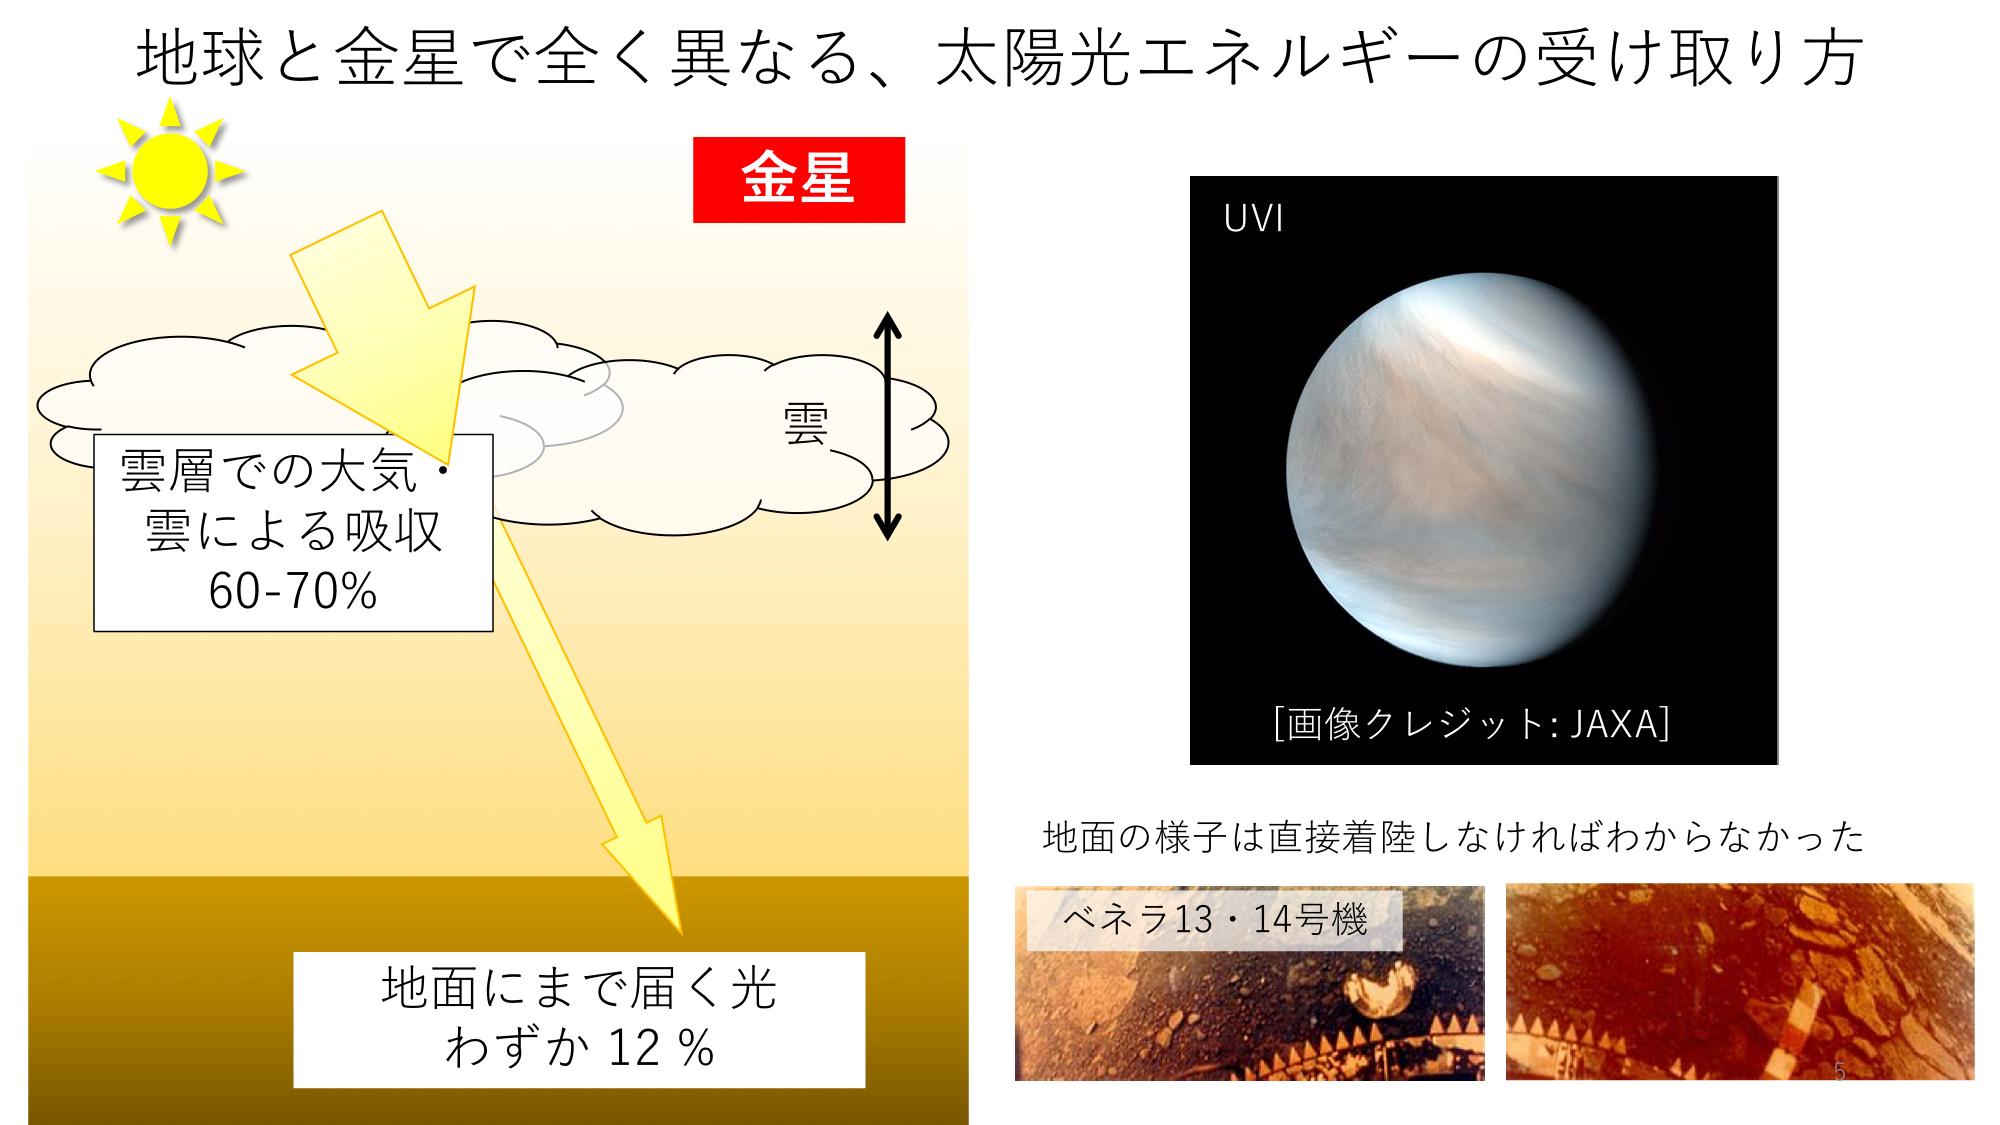 f:id:Imamura:20191119205354p:plain